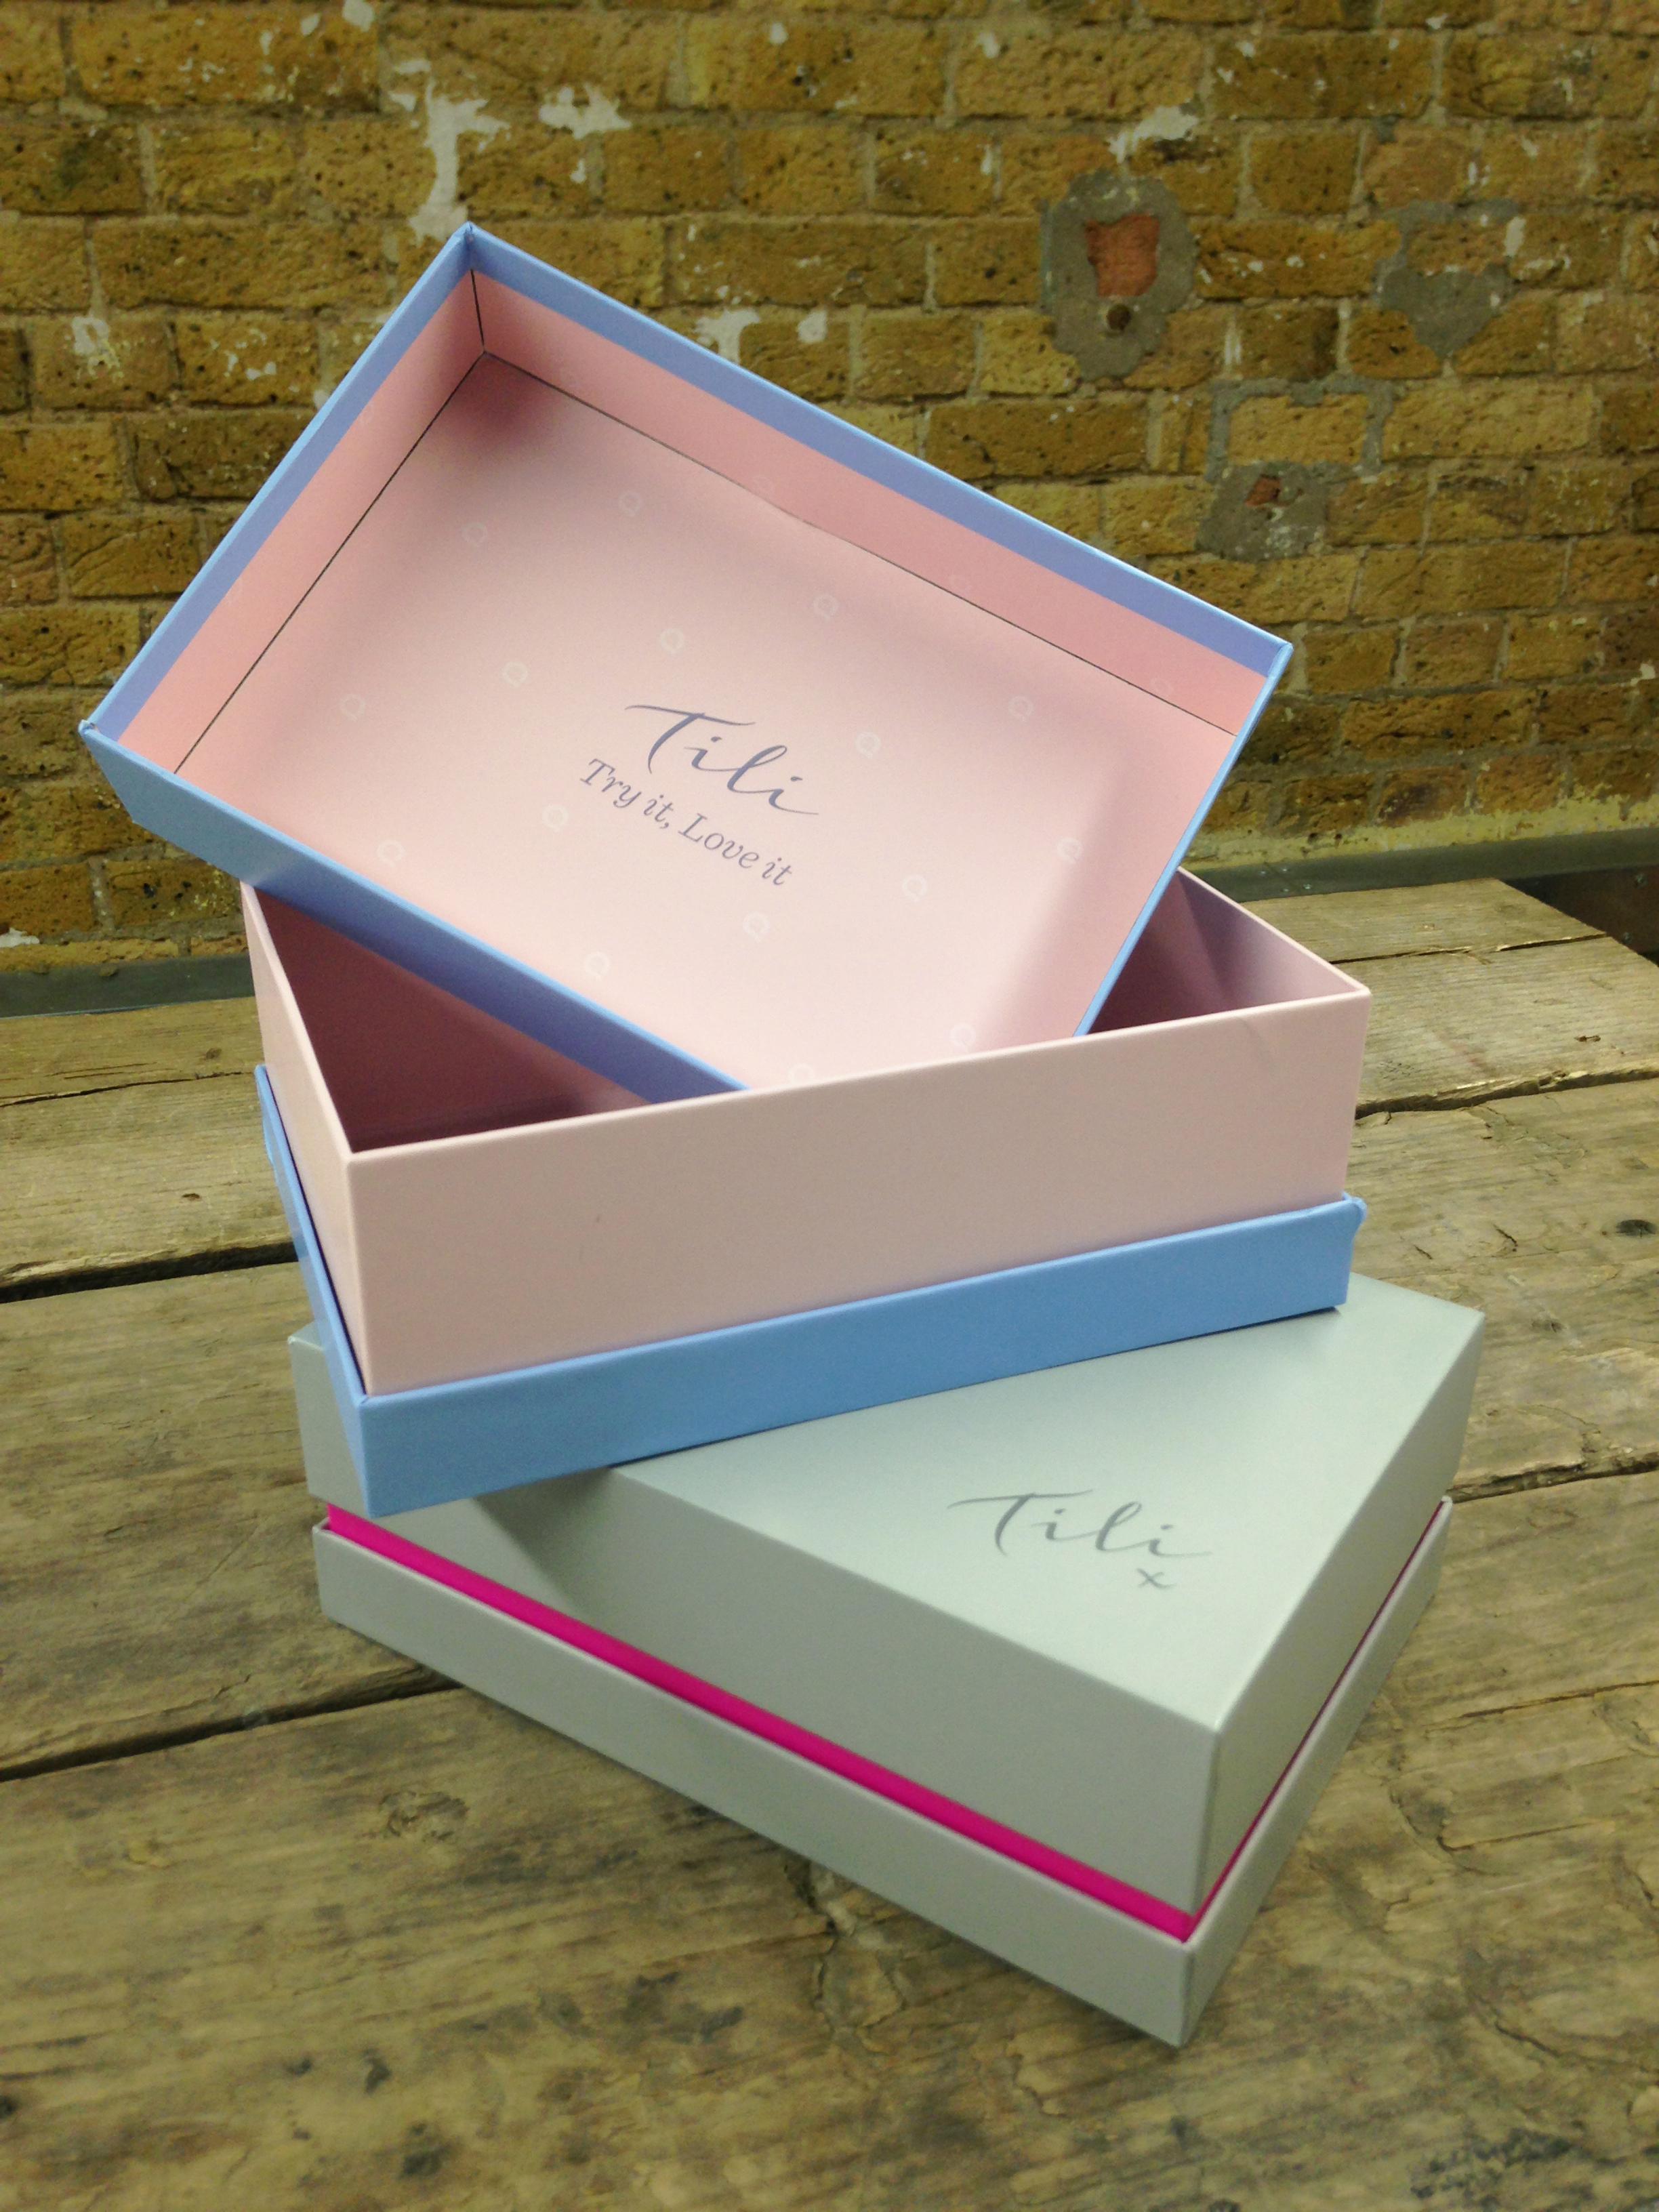 QVC Tili Box